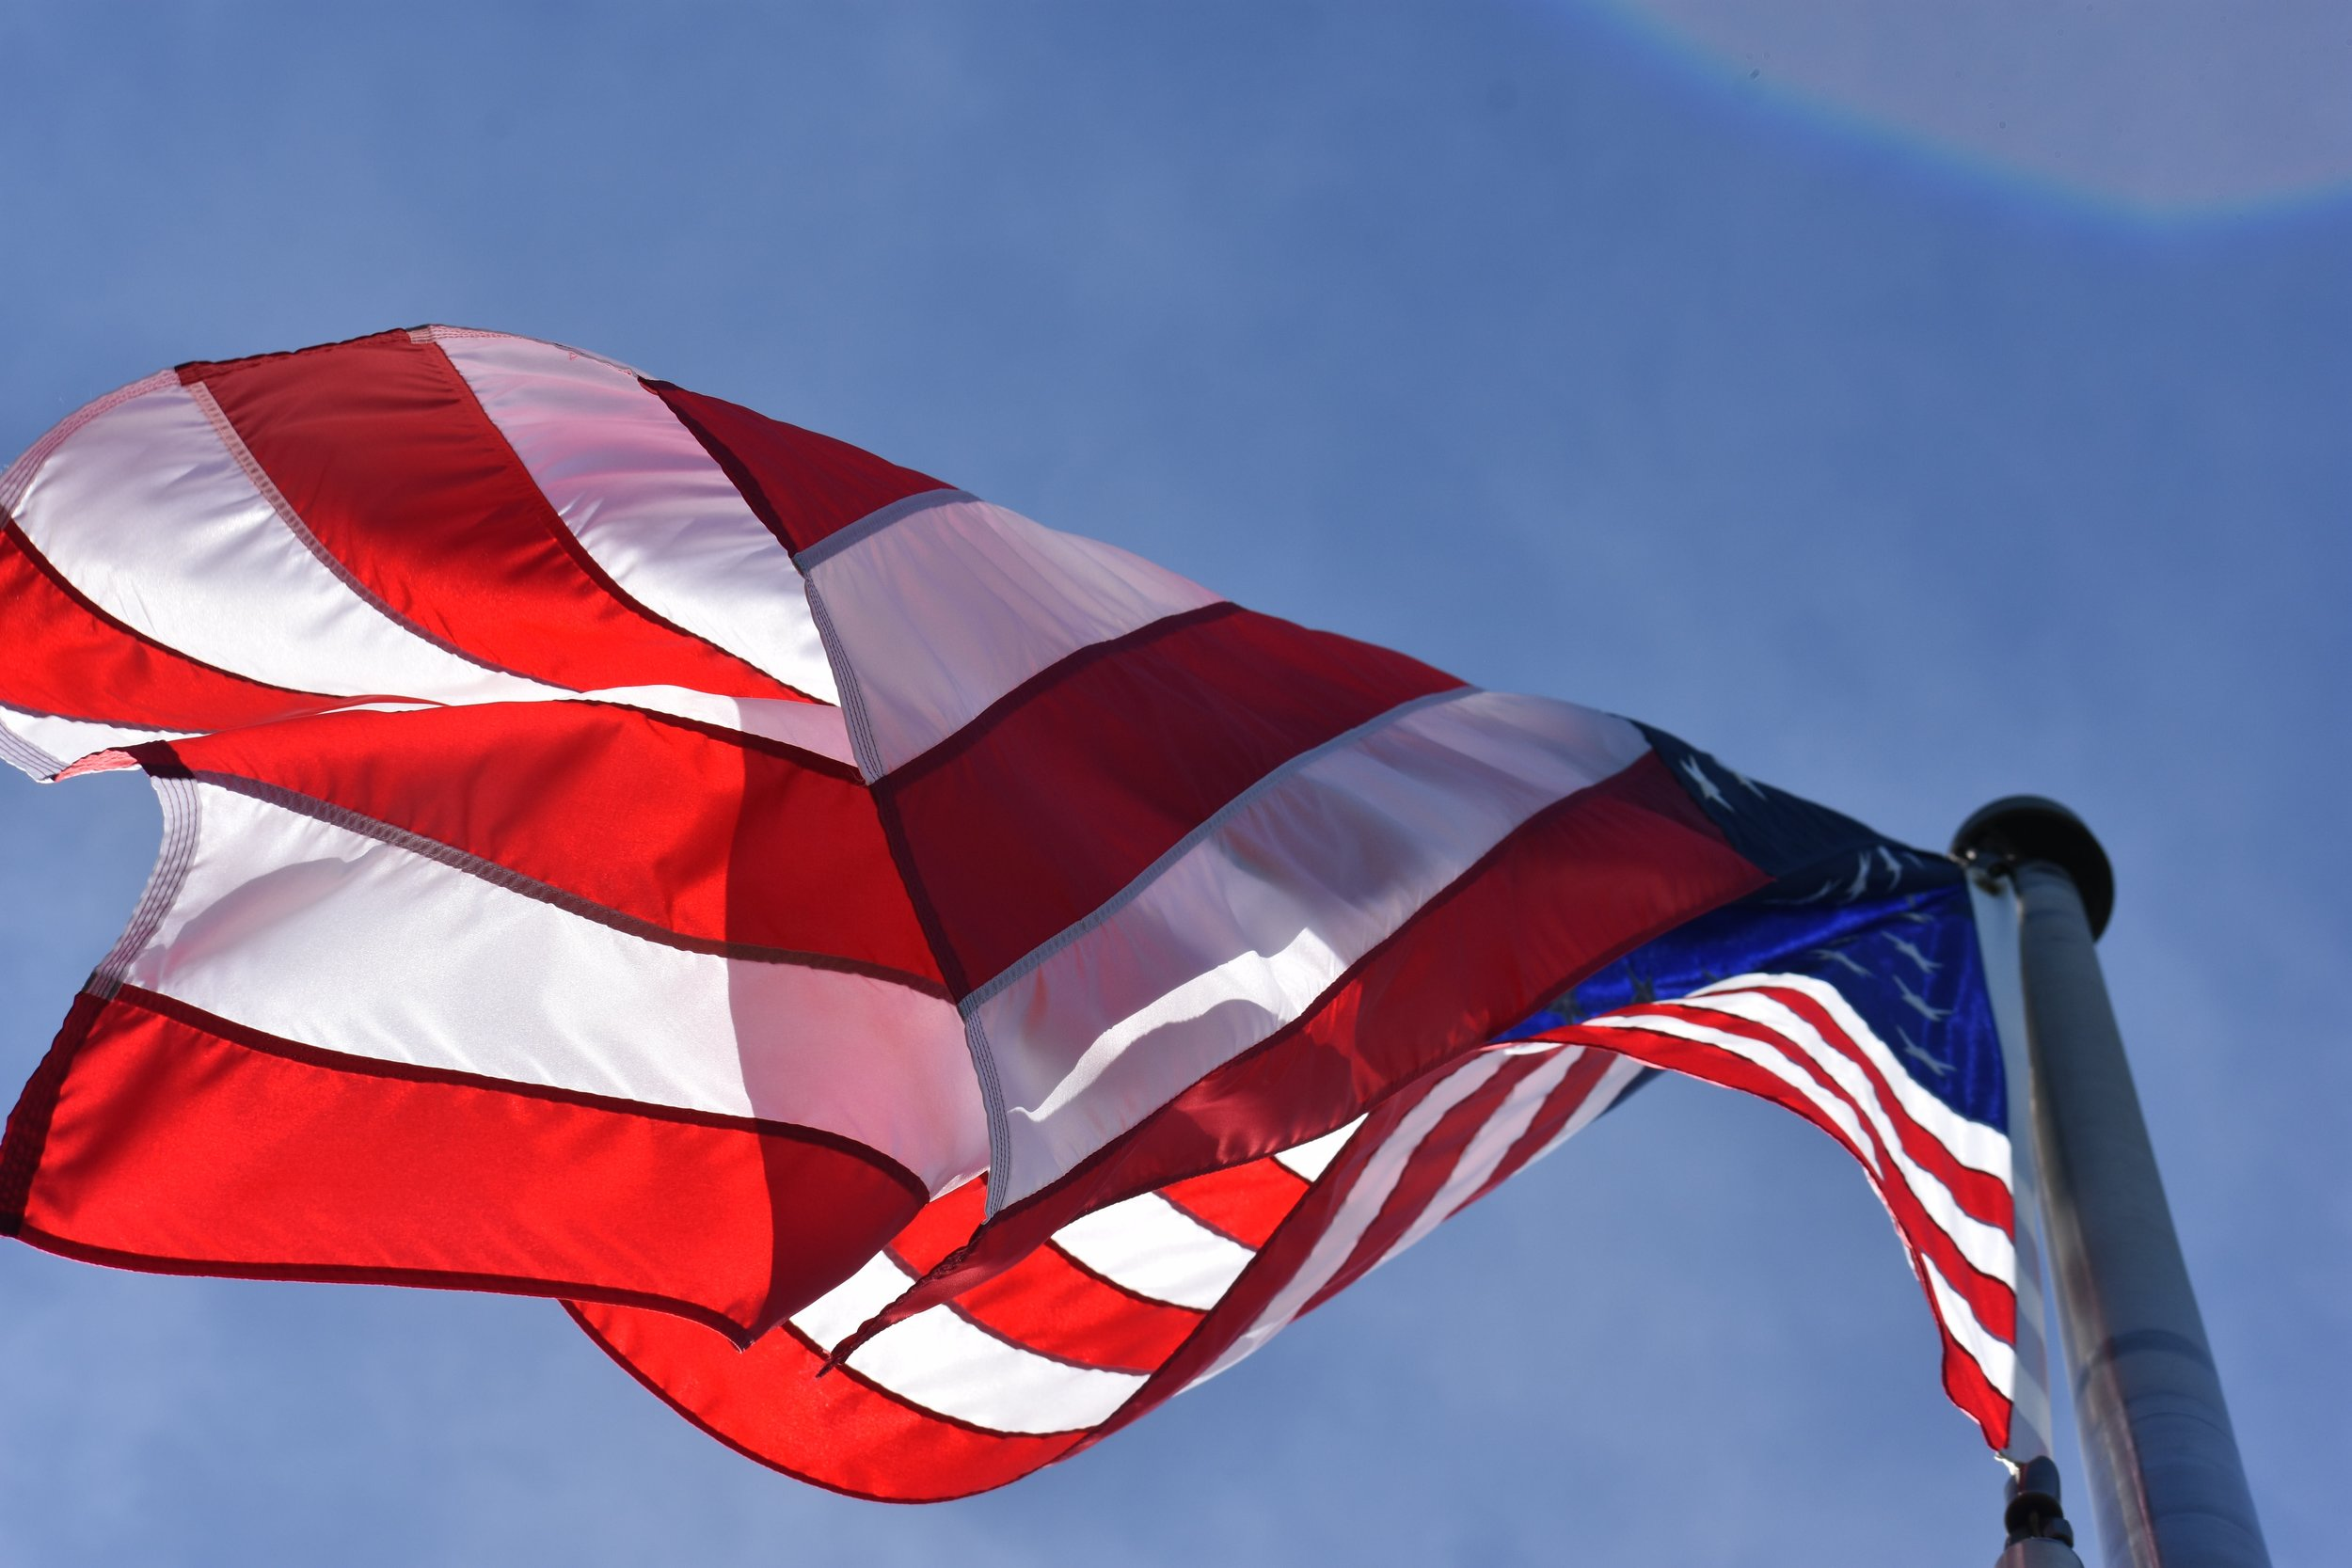 4th-of-july-america-american-flag-774316